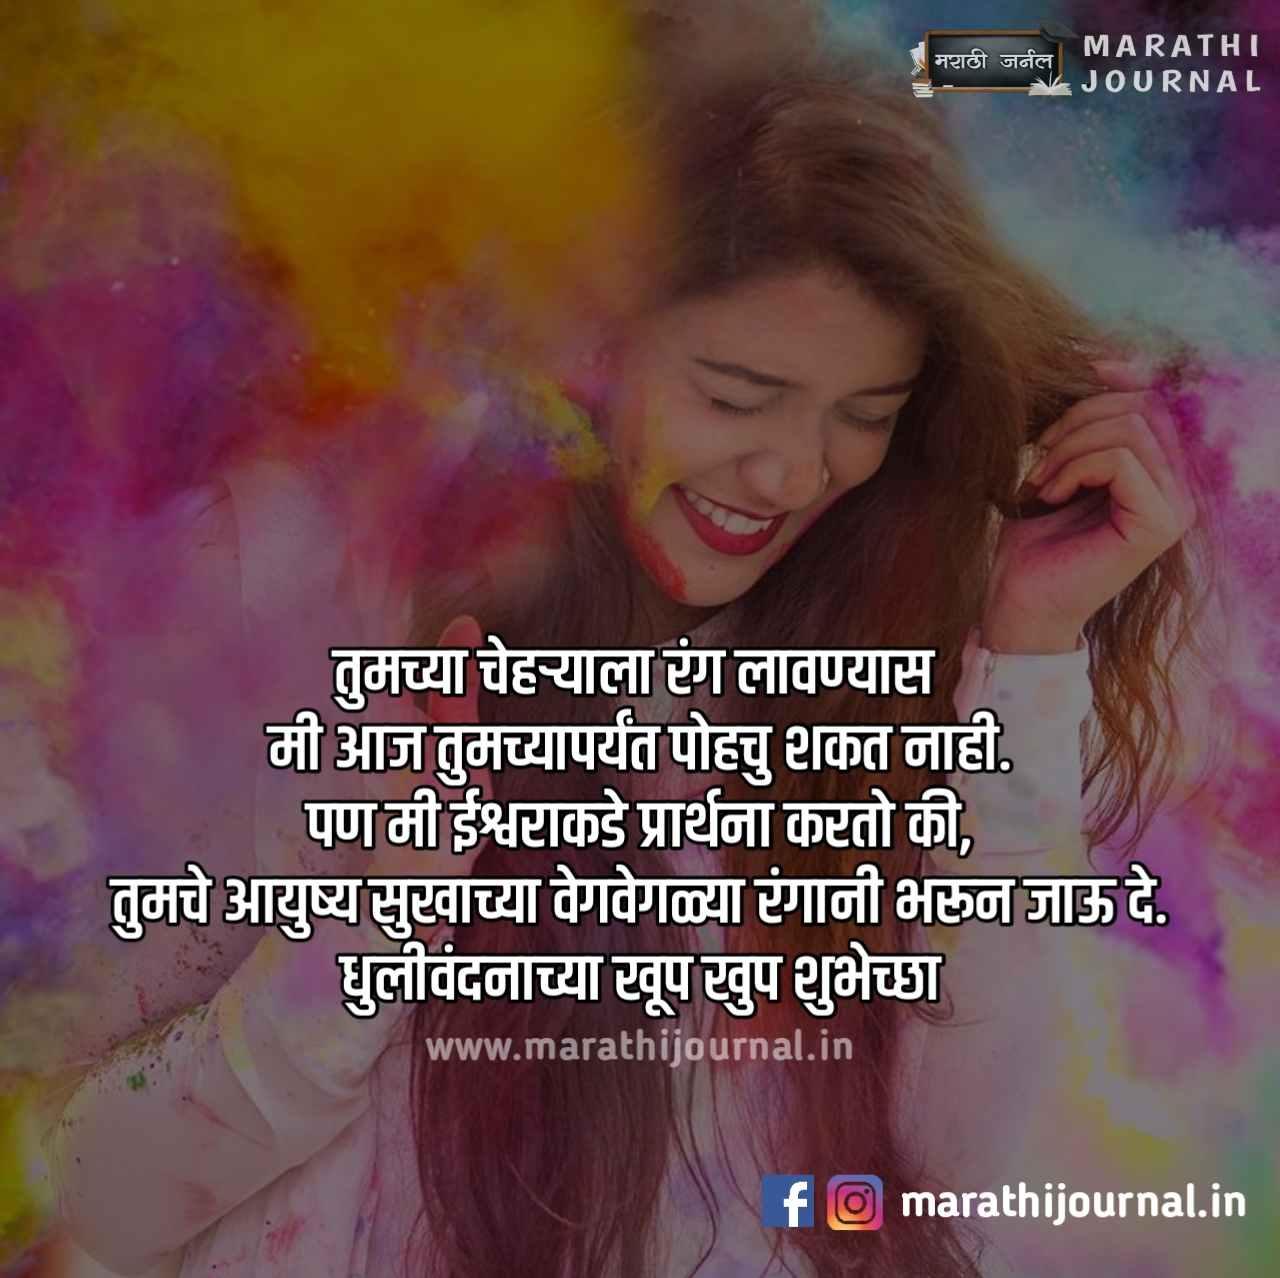 होळीच्या हार्दिक शुभेच्छा   Happy Holi Wishes in Marathi